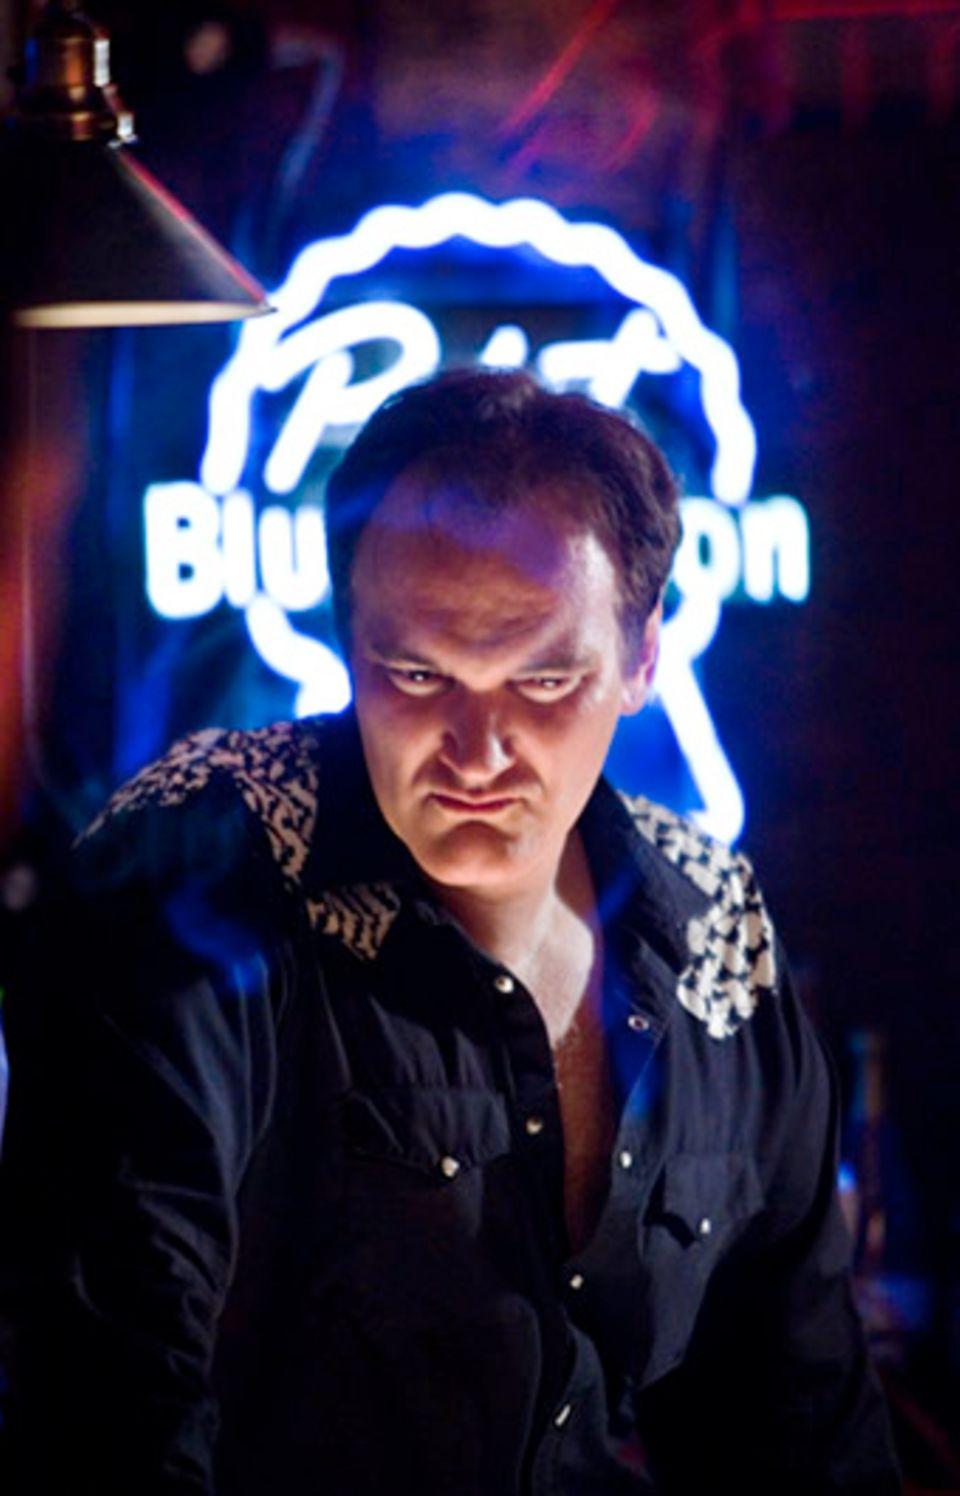 Quentin Tarantino in seinem Element